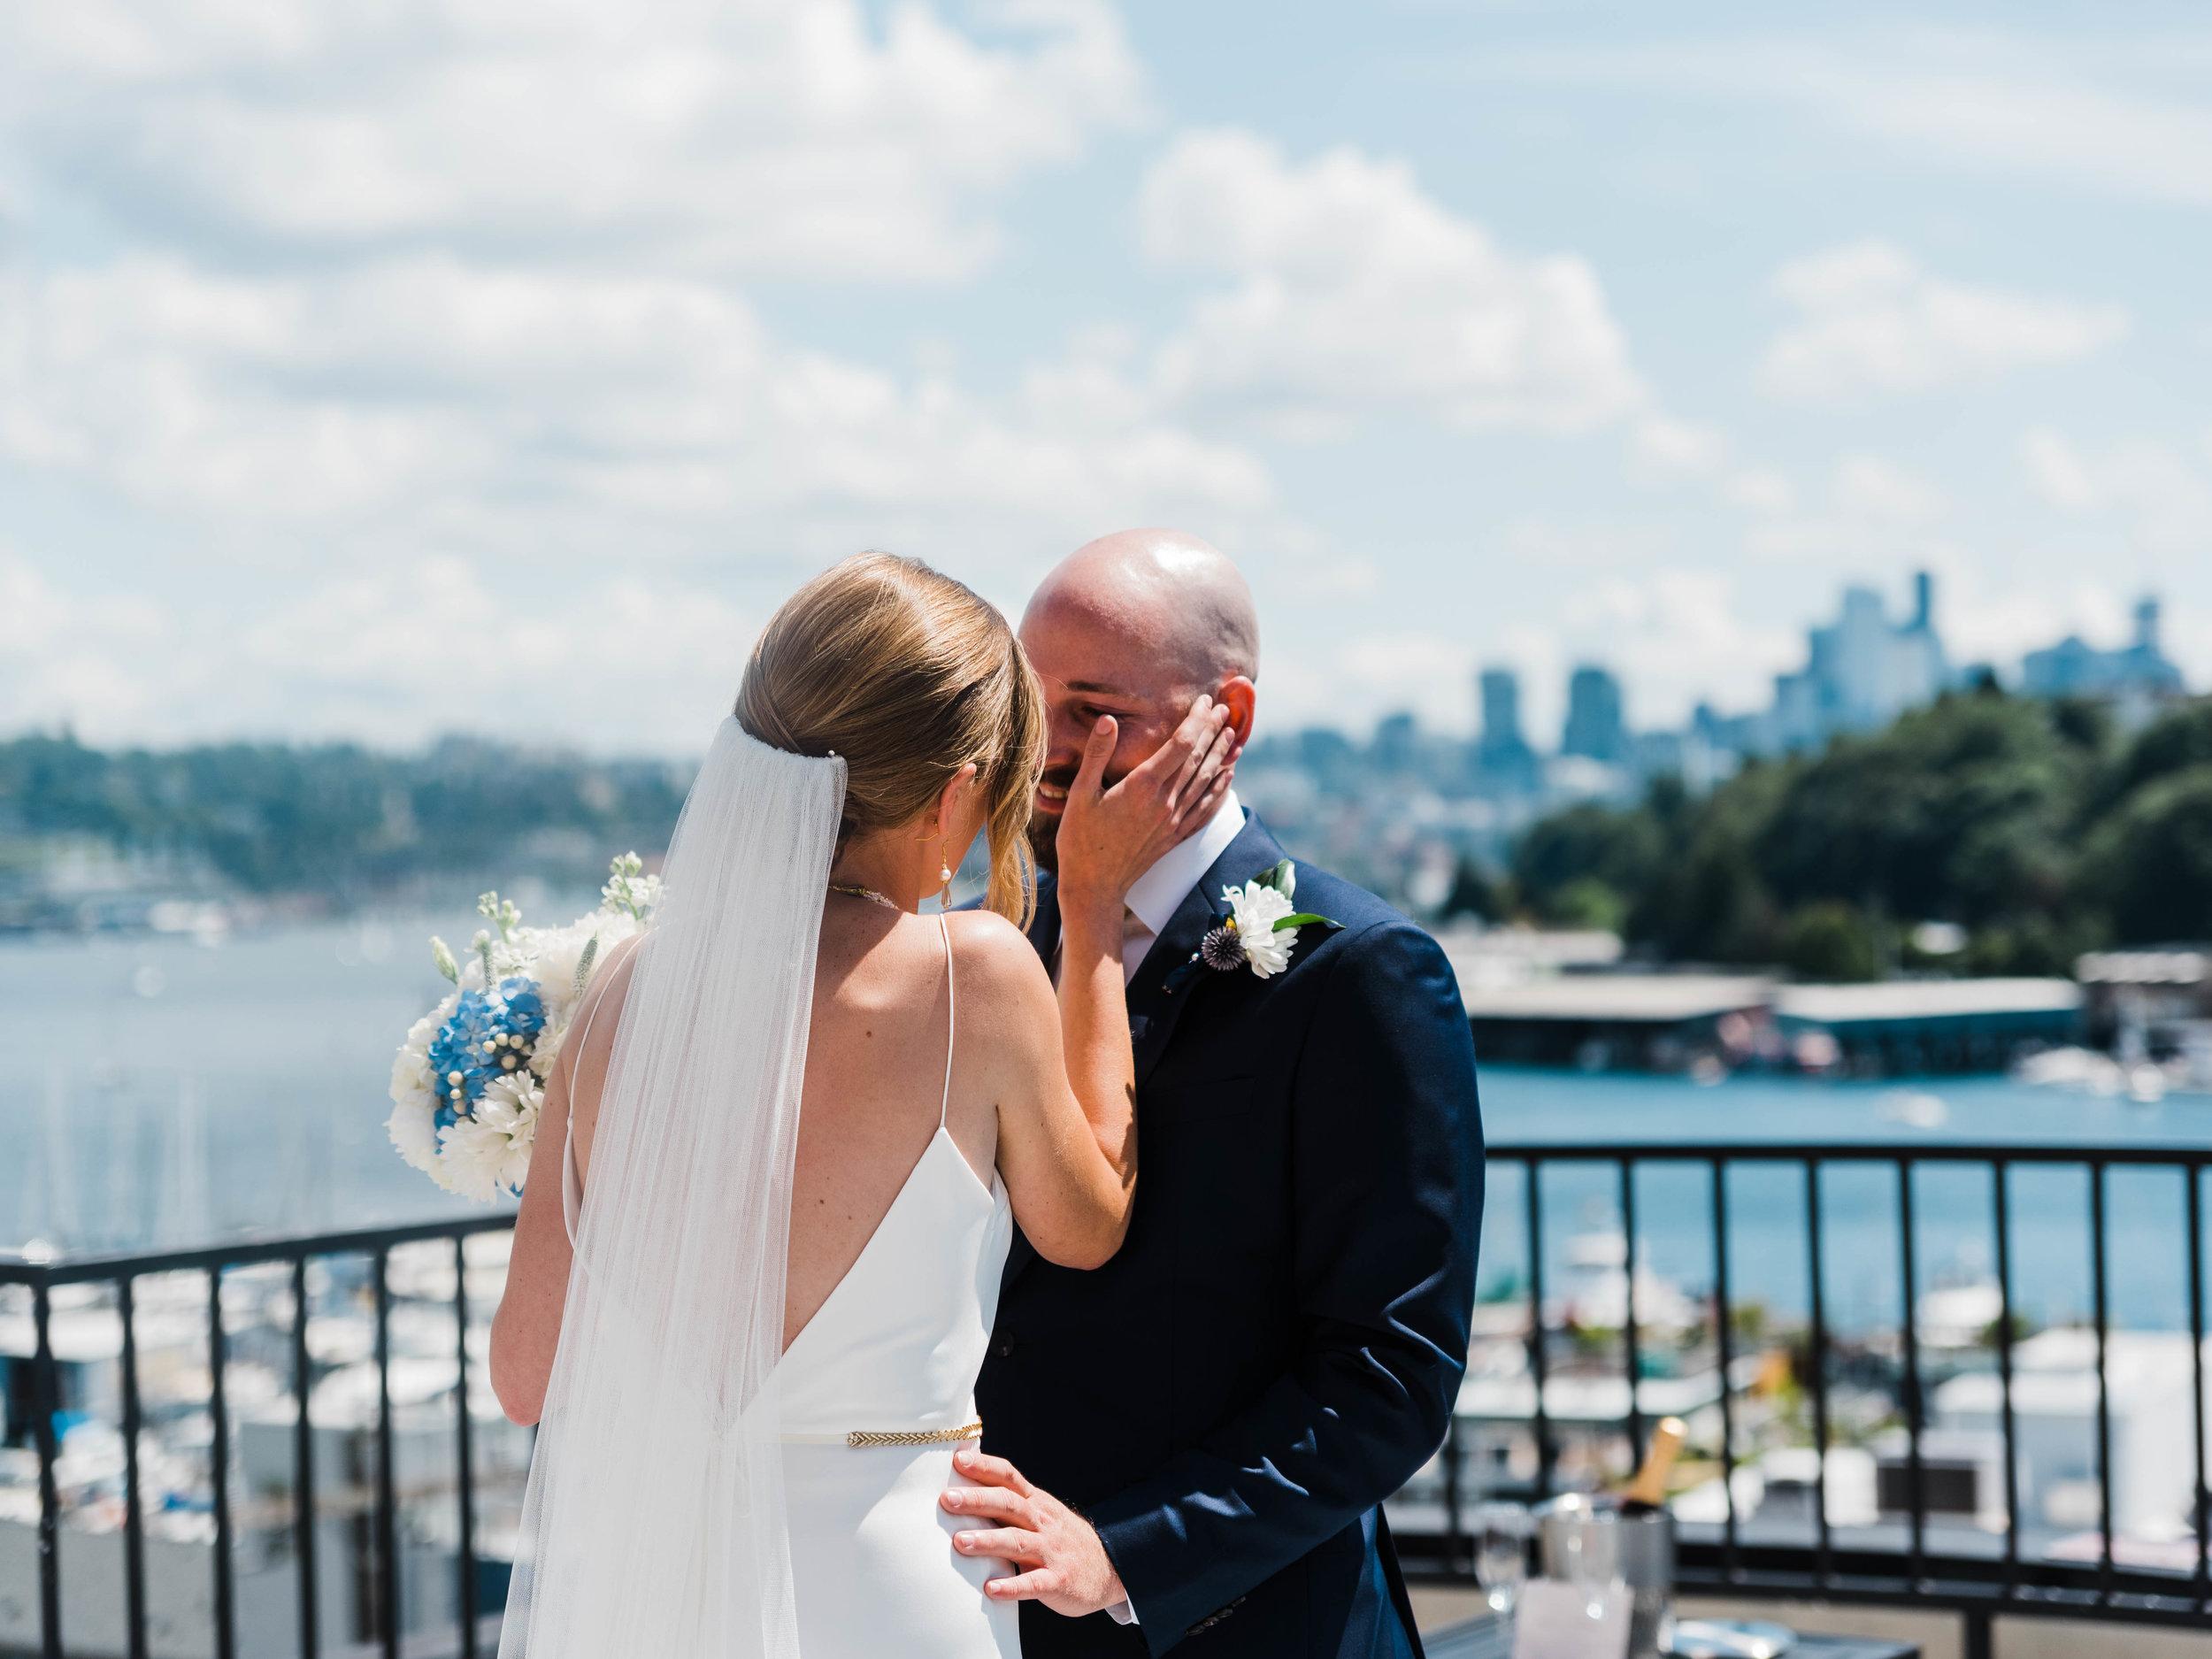 Seattle Wedding- MV Skansonia - Anna + Josh -  (352) - Copy.jpg